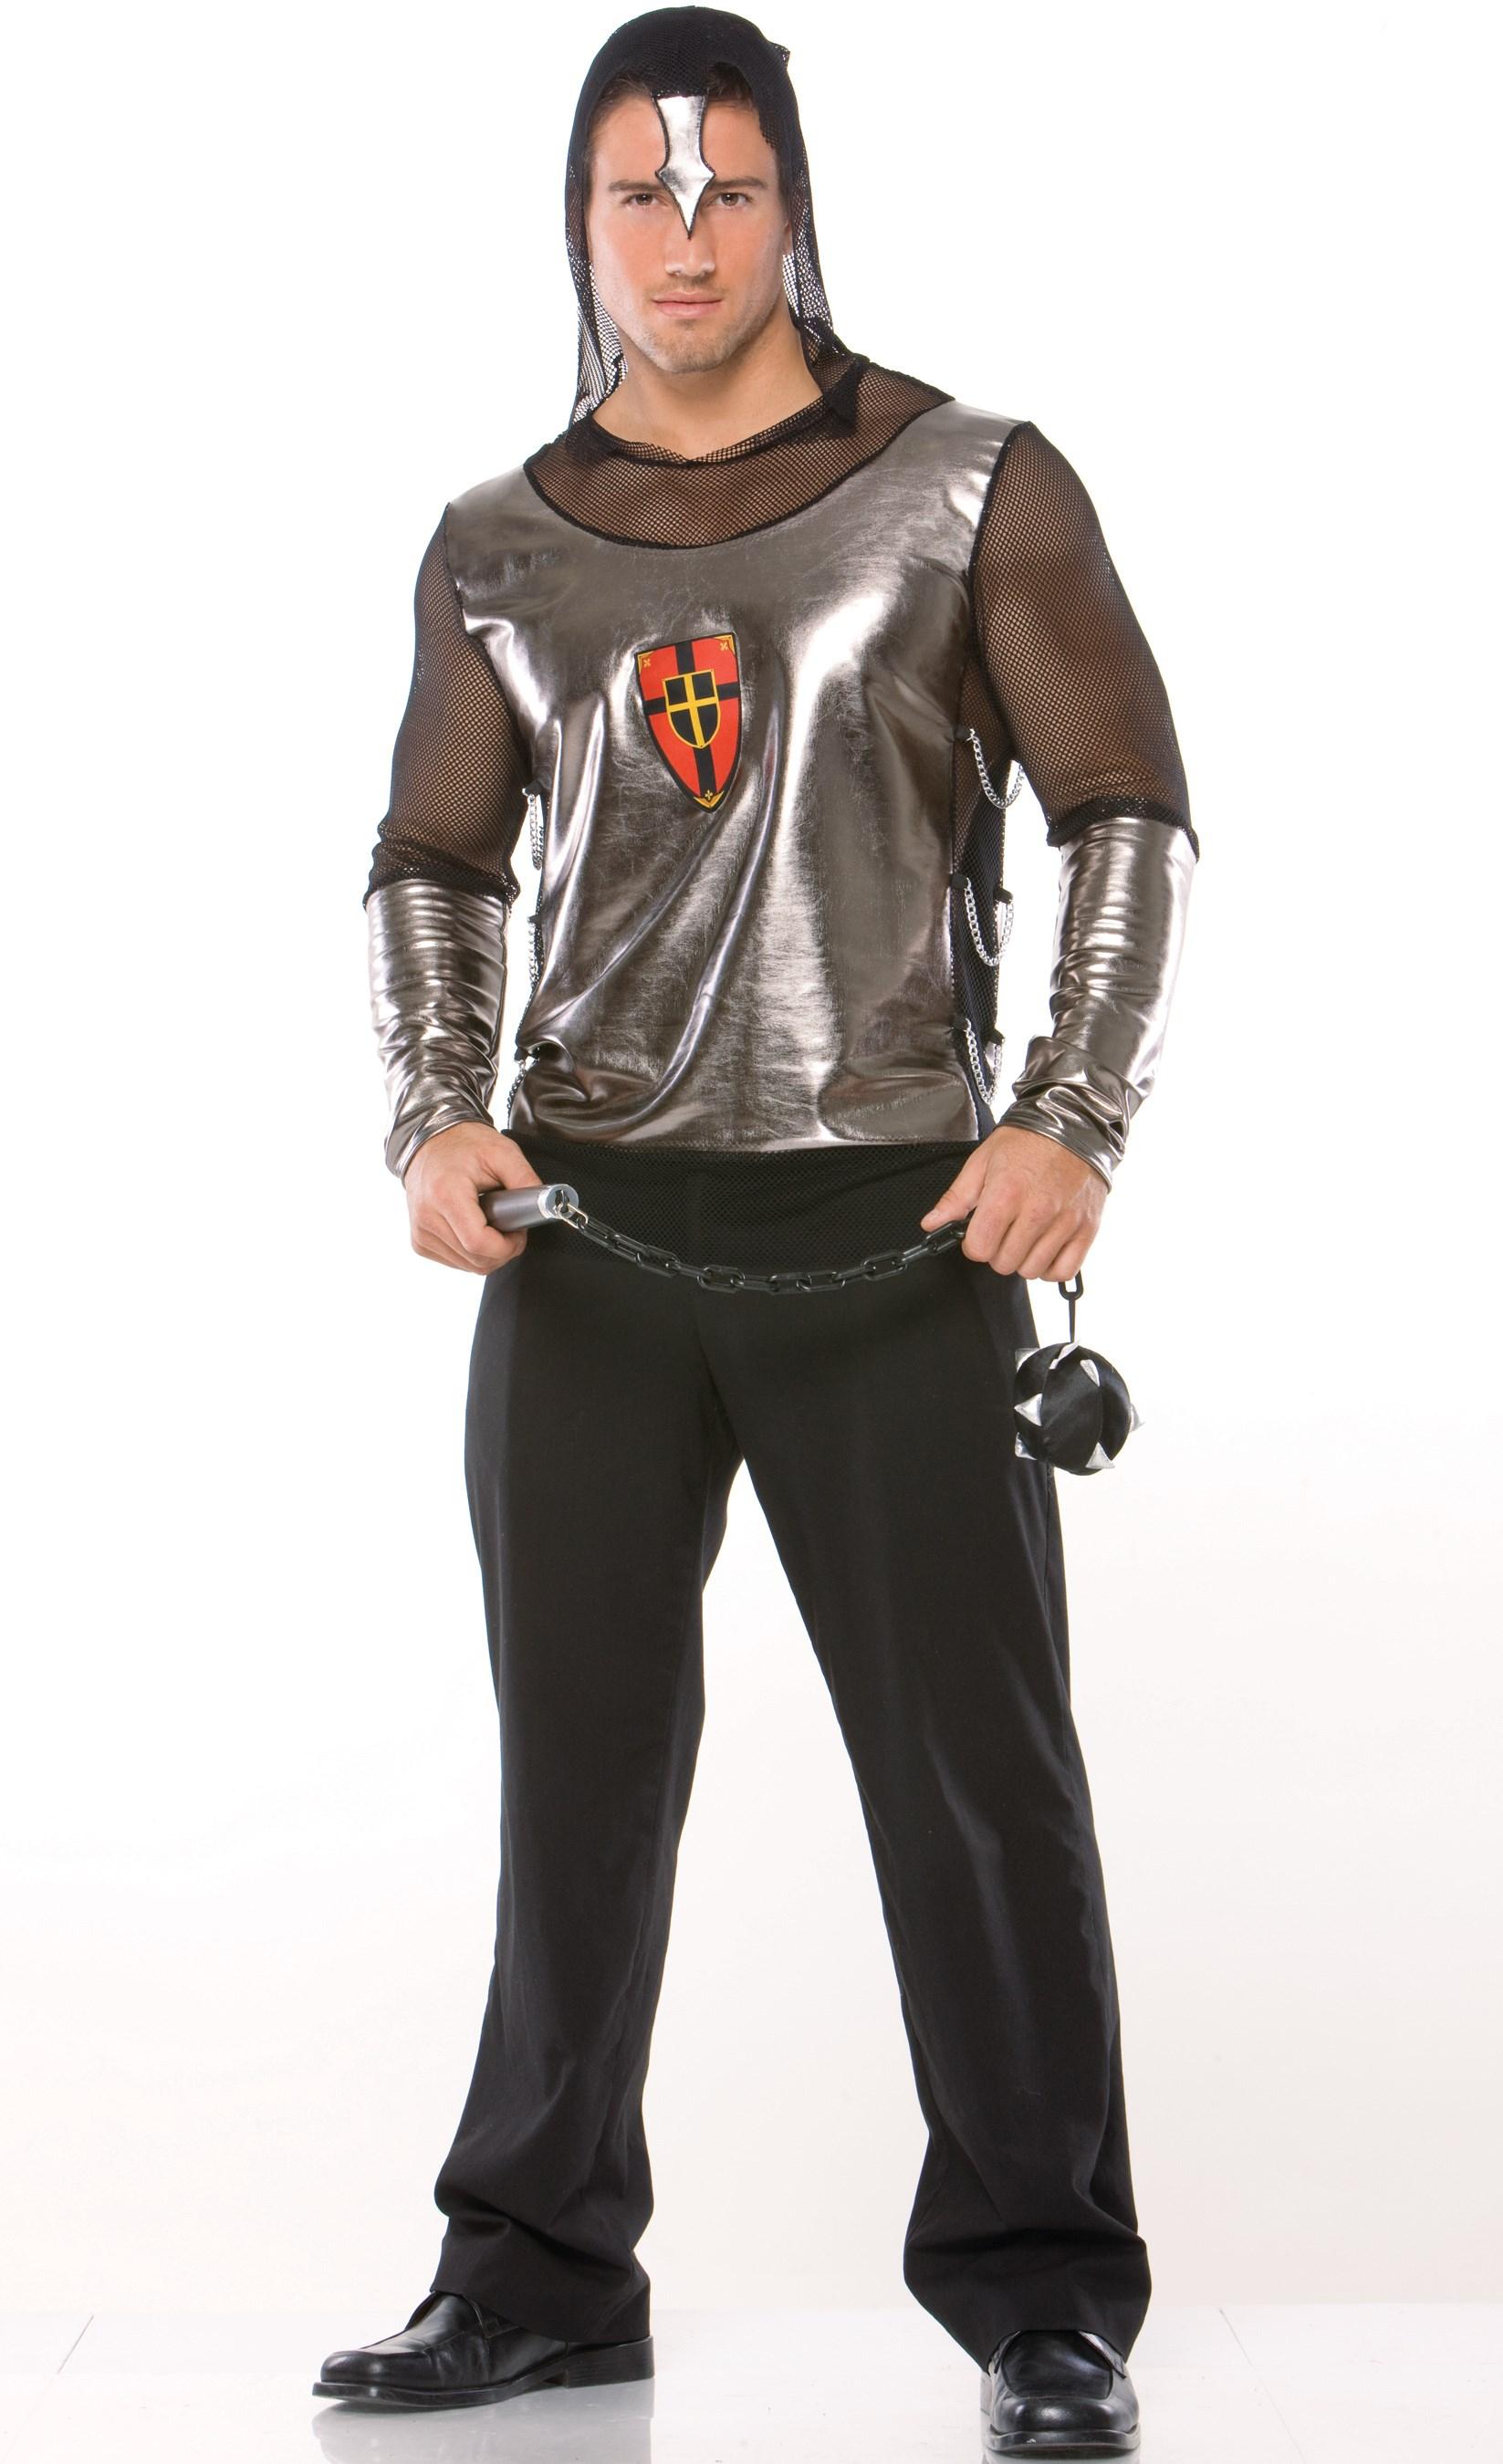 Medieval Guy Adult Costume